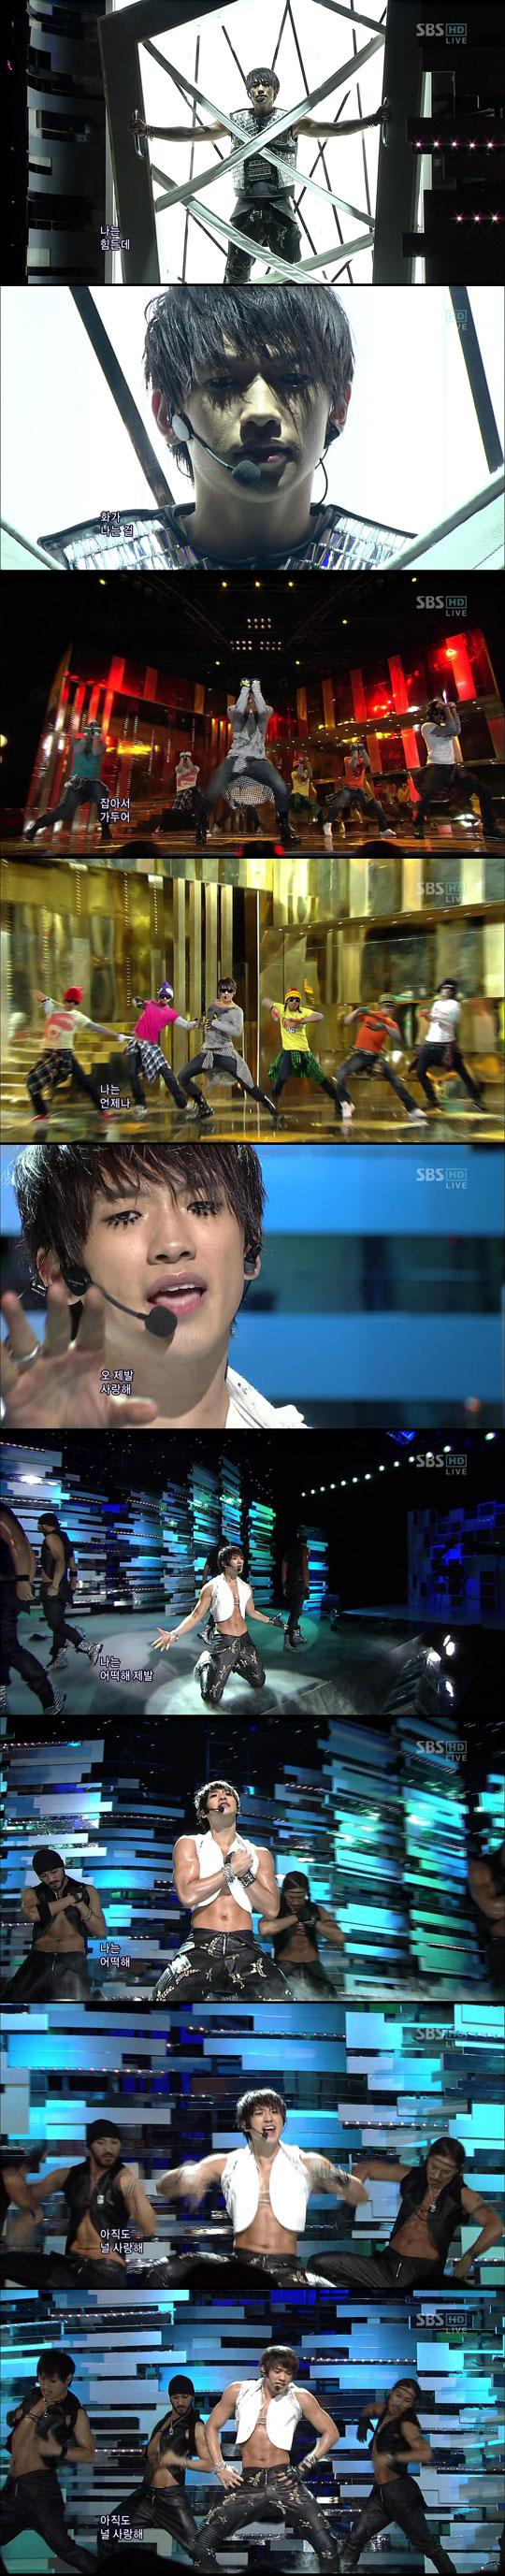 100411-inkigayo-01.jpg